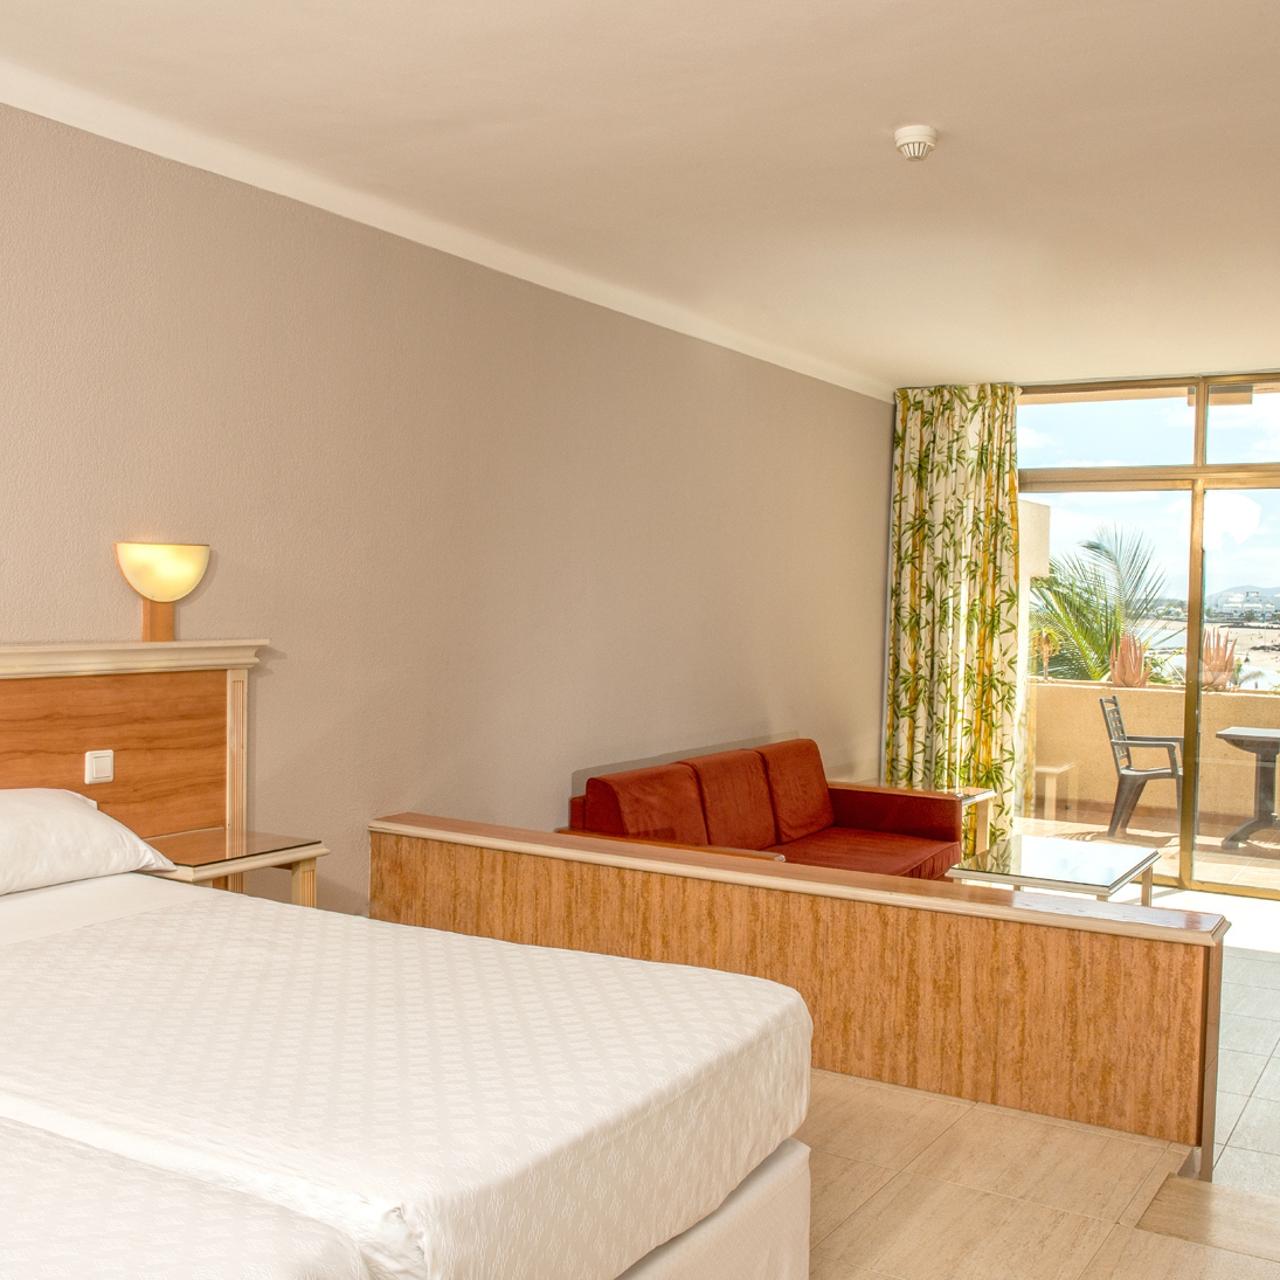 Hotel Beatriz Playa Spa 4 Hrs Star Hotel In Tias Canary Islands